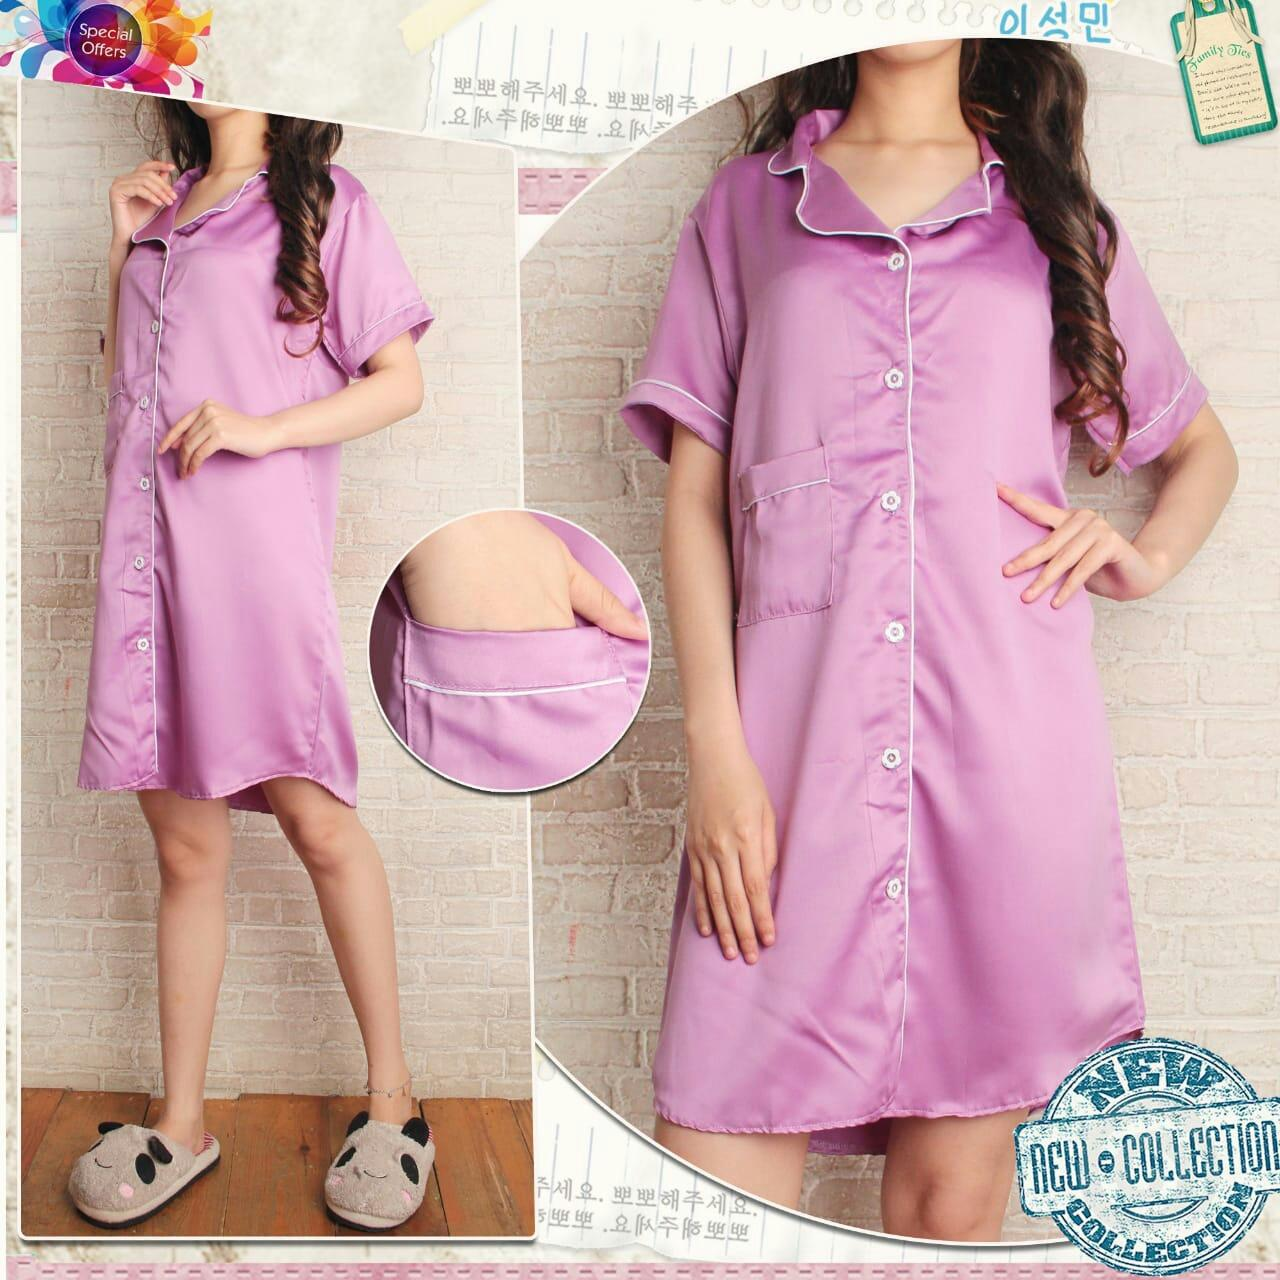 Kekinian_Shop Pajamas Satin Daster/Baju Tidur/Pajamas Kekinian/Fashion Wanita/Fashion Pria